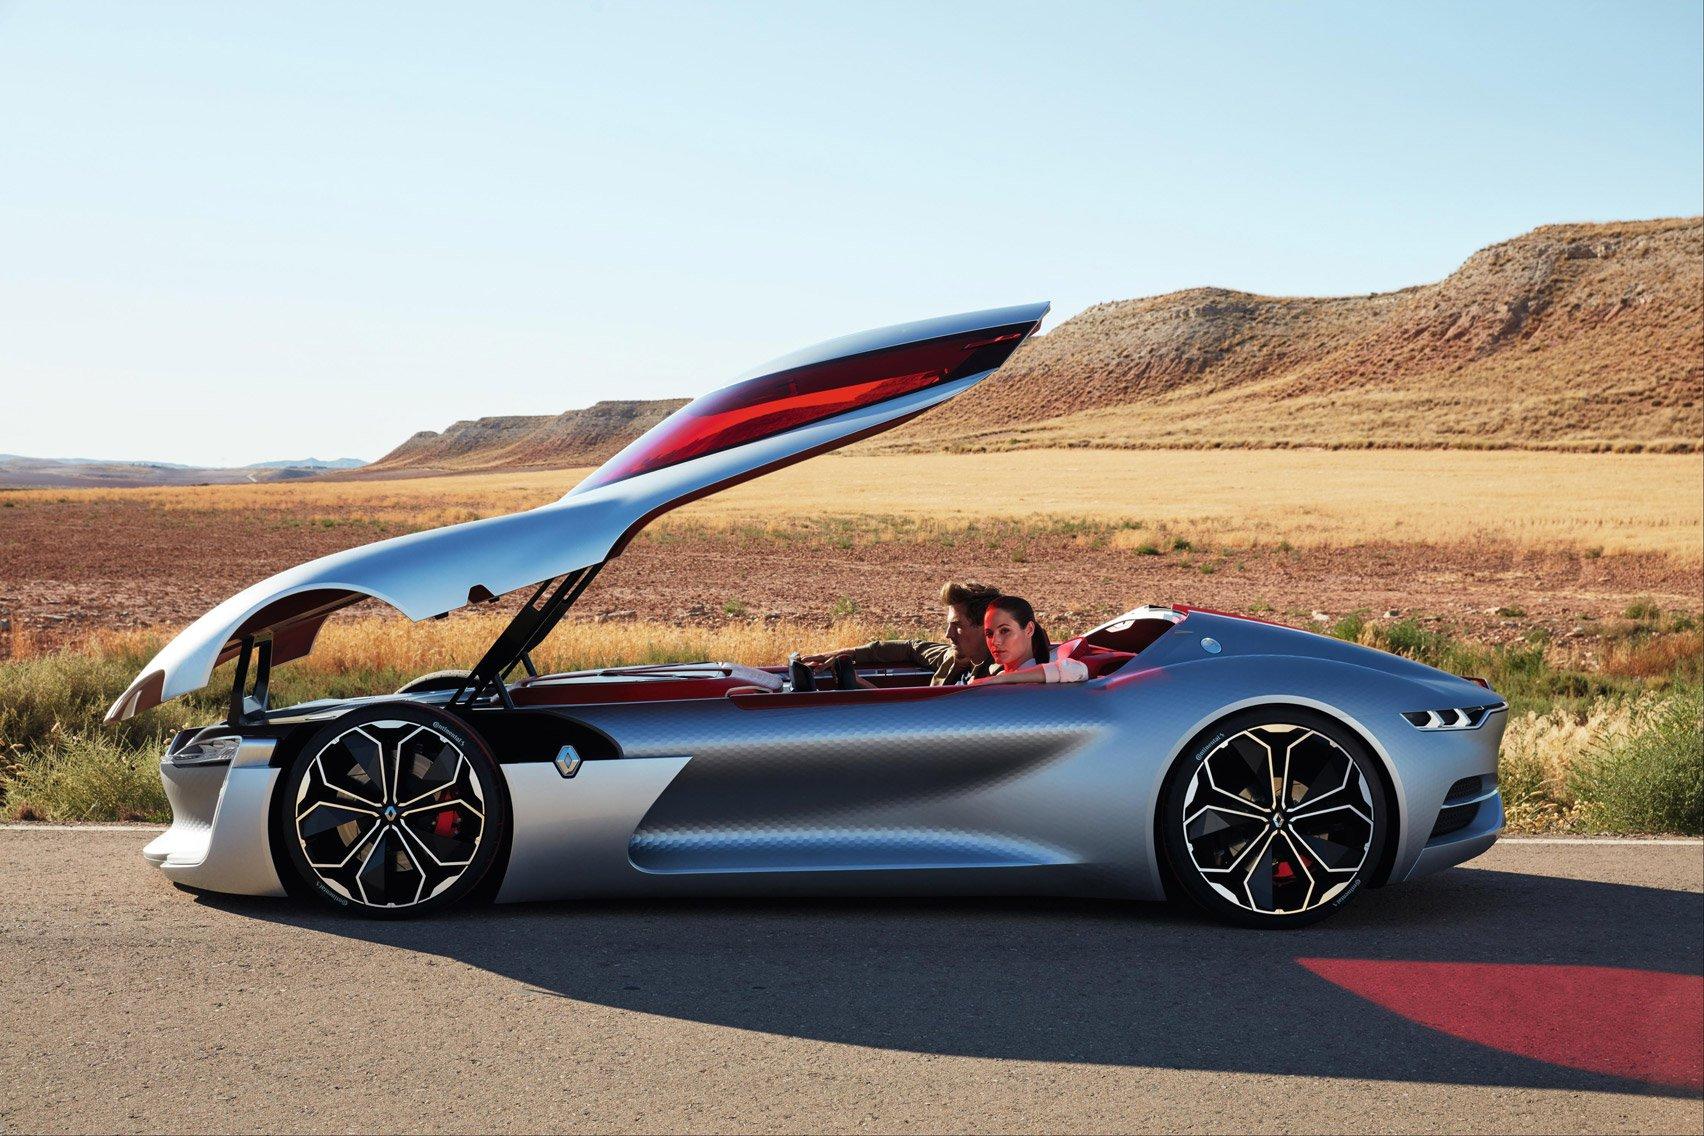 renault-trezor-concept-car-paris-motor-show_dezeen_1704_col_6